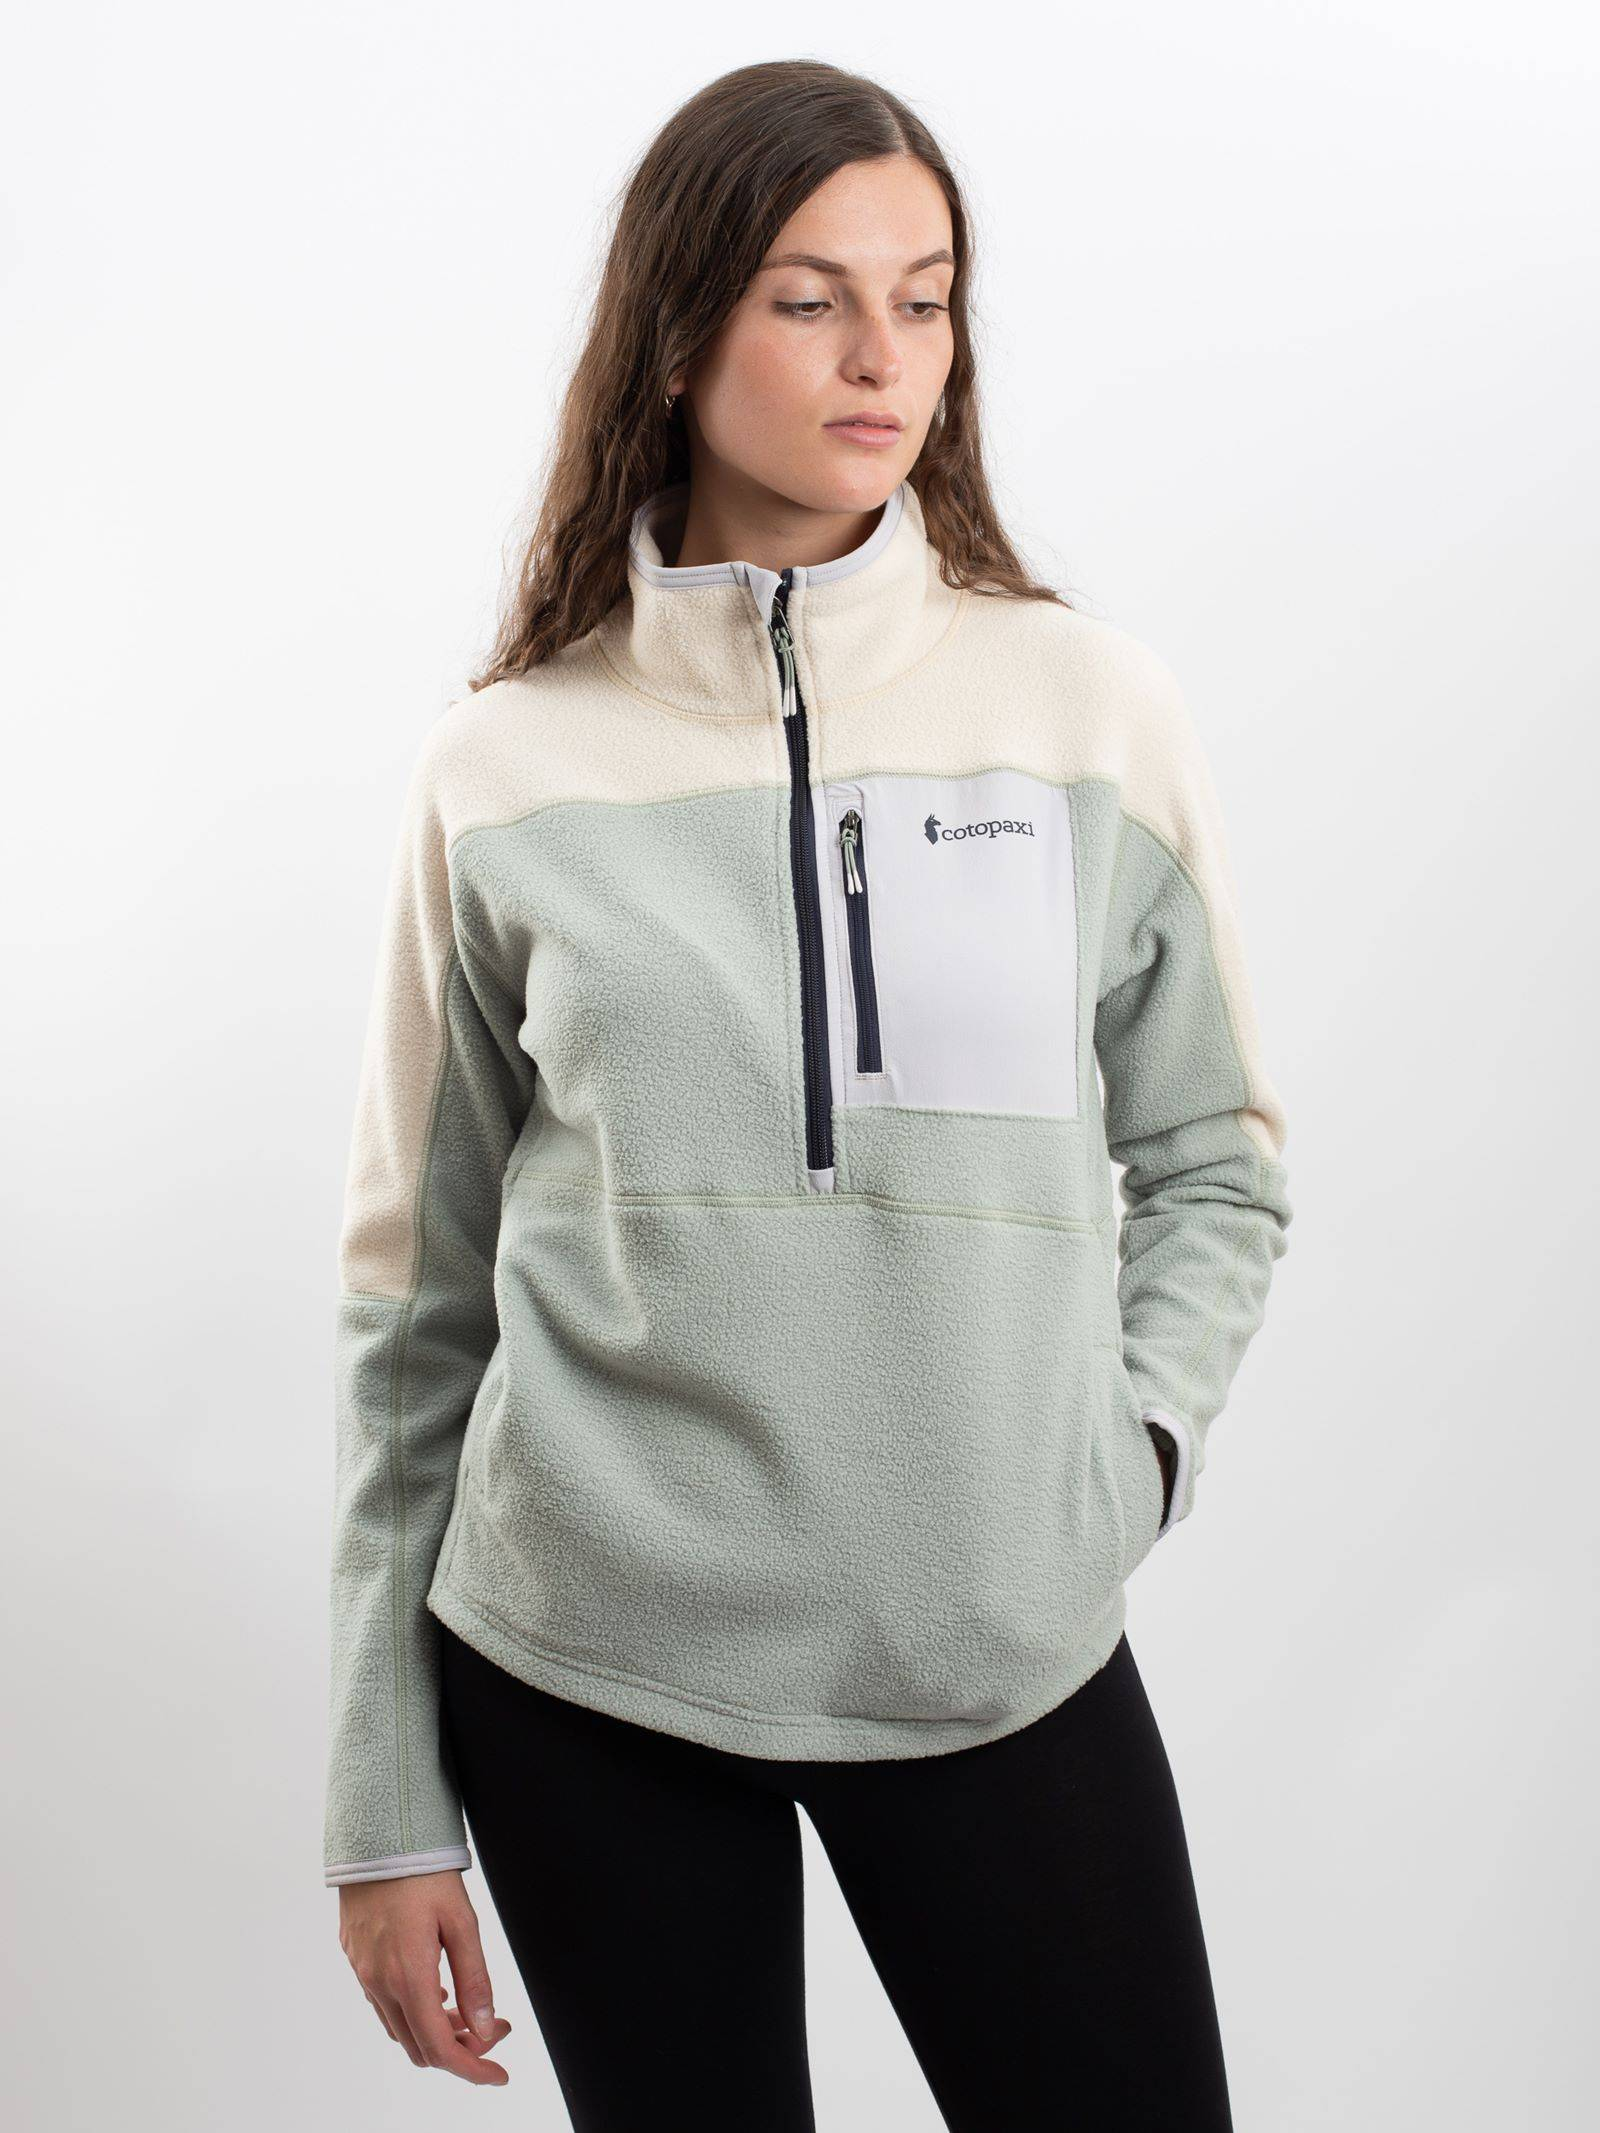 Cotopaxi Women's Abrazo Half-Zip Fleece Jacket In Cream & Brush  - Green - Size: Medium